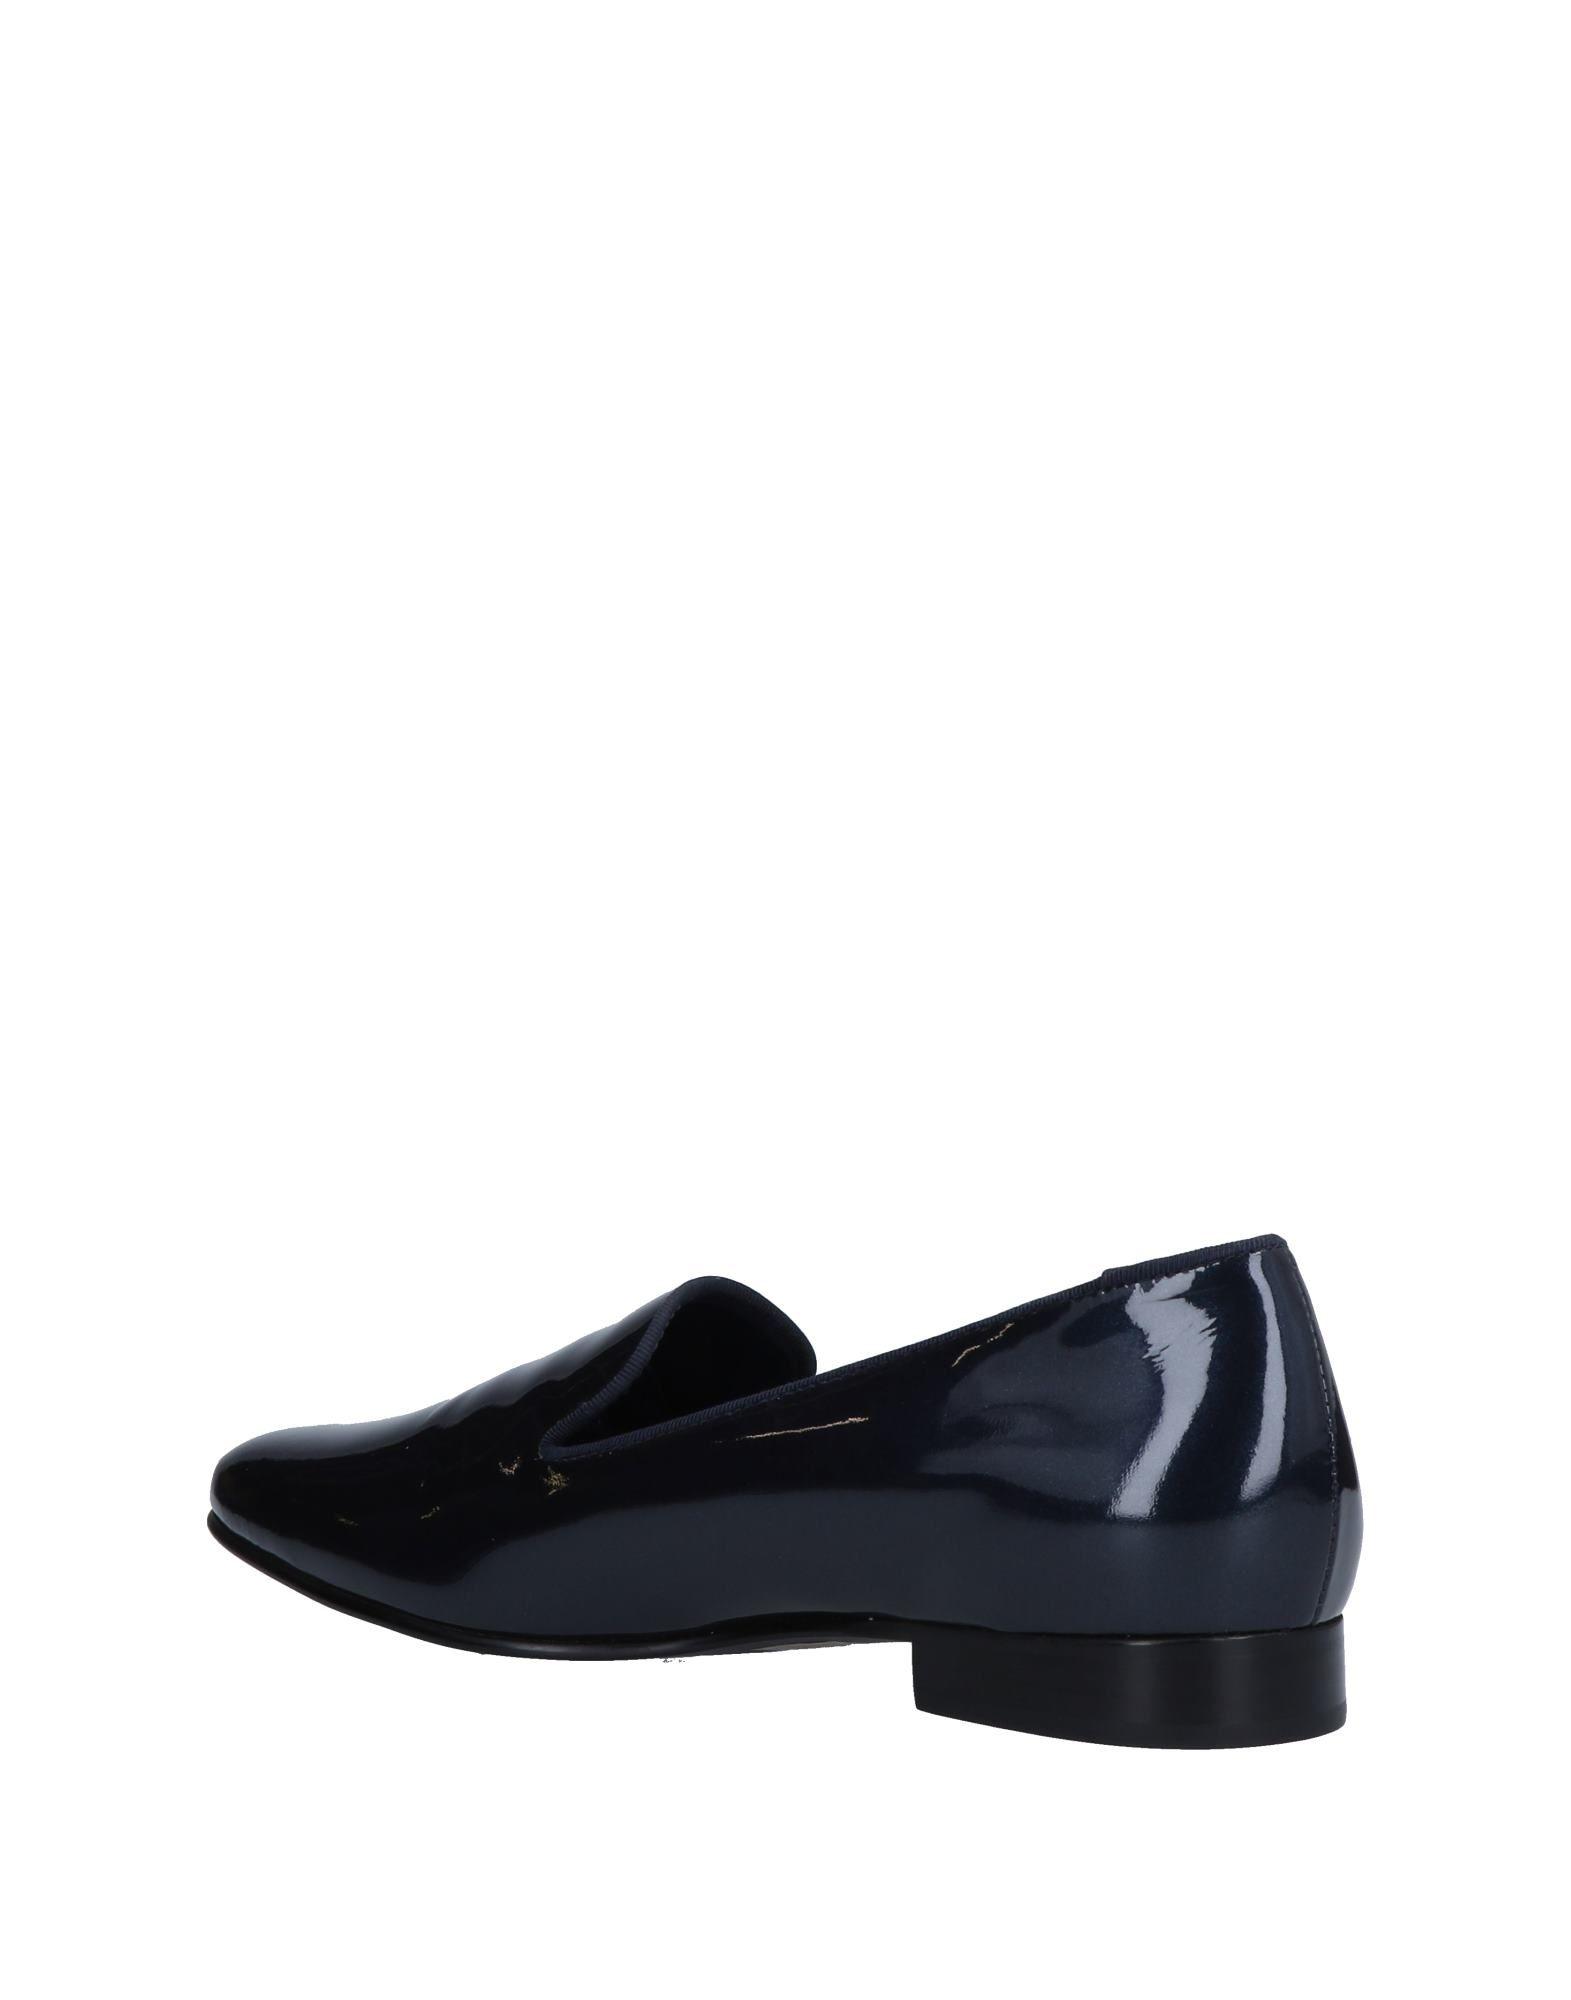 Gut Pazolini um billige Schuhe zu tragenCarlo Pazolini Gut Mokassins Damen  11519171DU 9b92d1